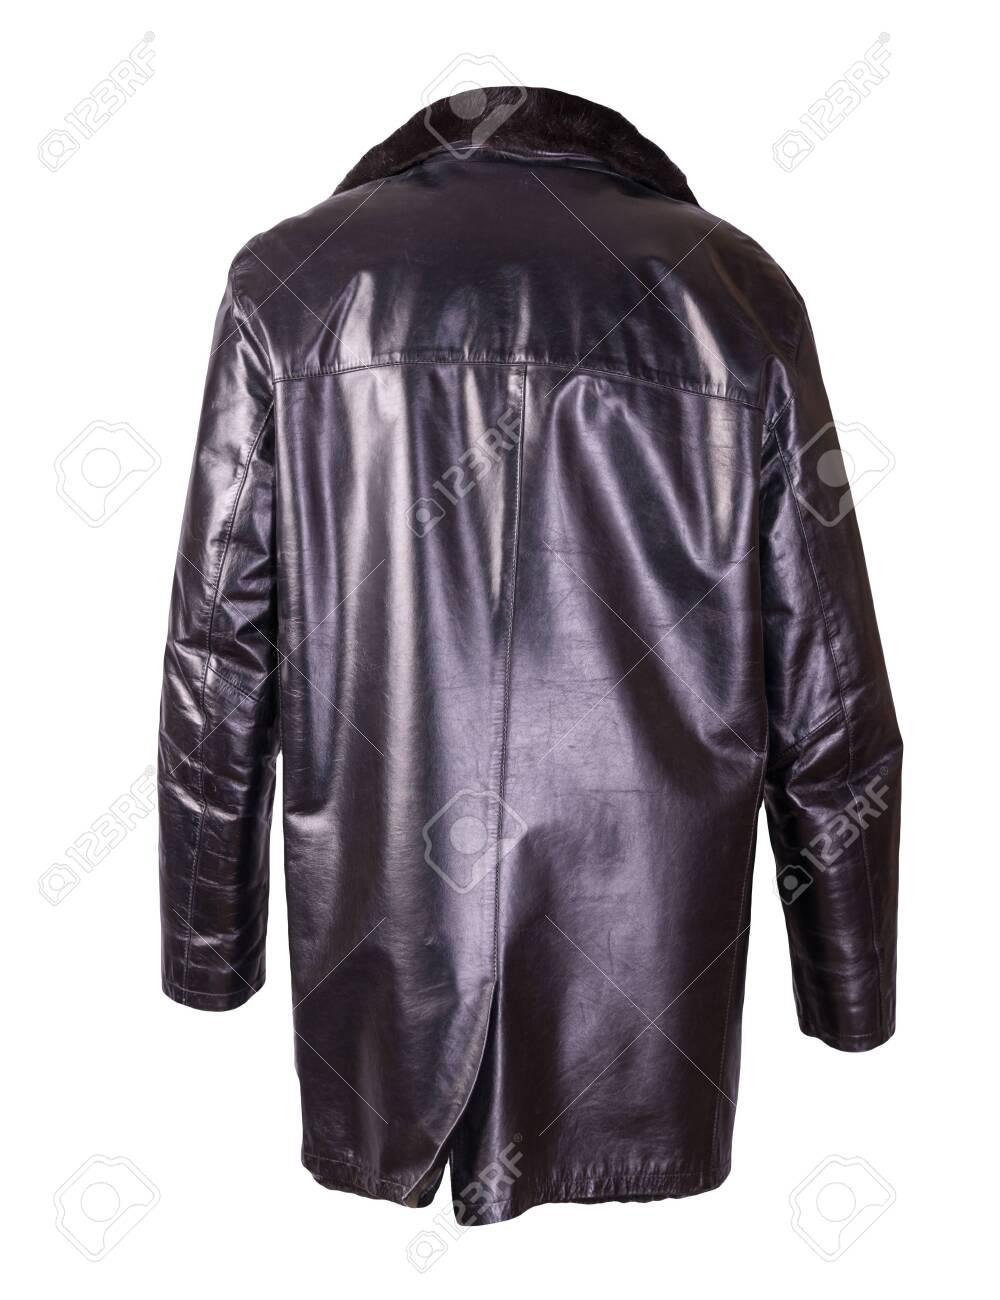 leather male sheepskin coat isolated on white background.black leather men's jacket with fur - 146341512